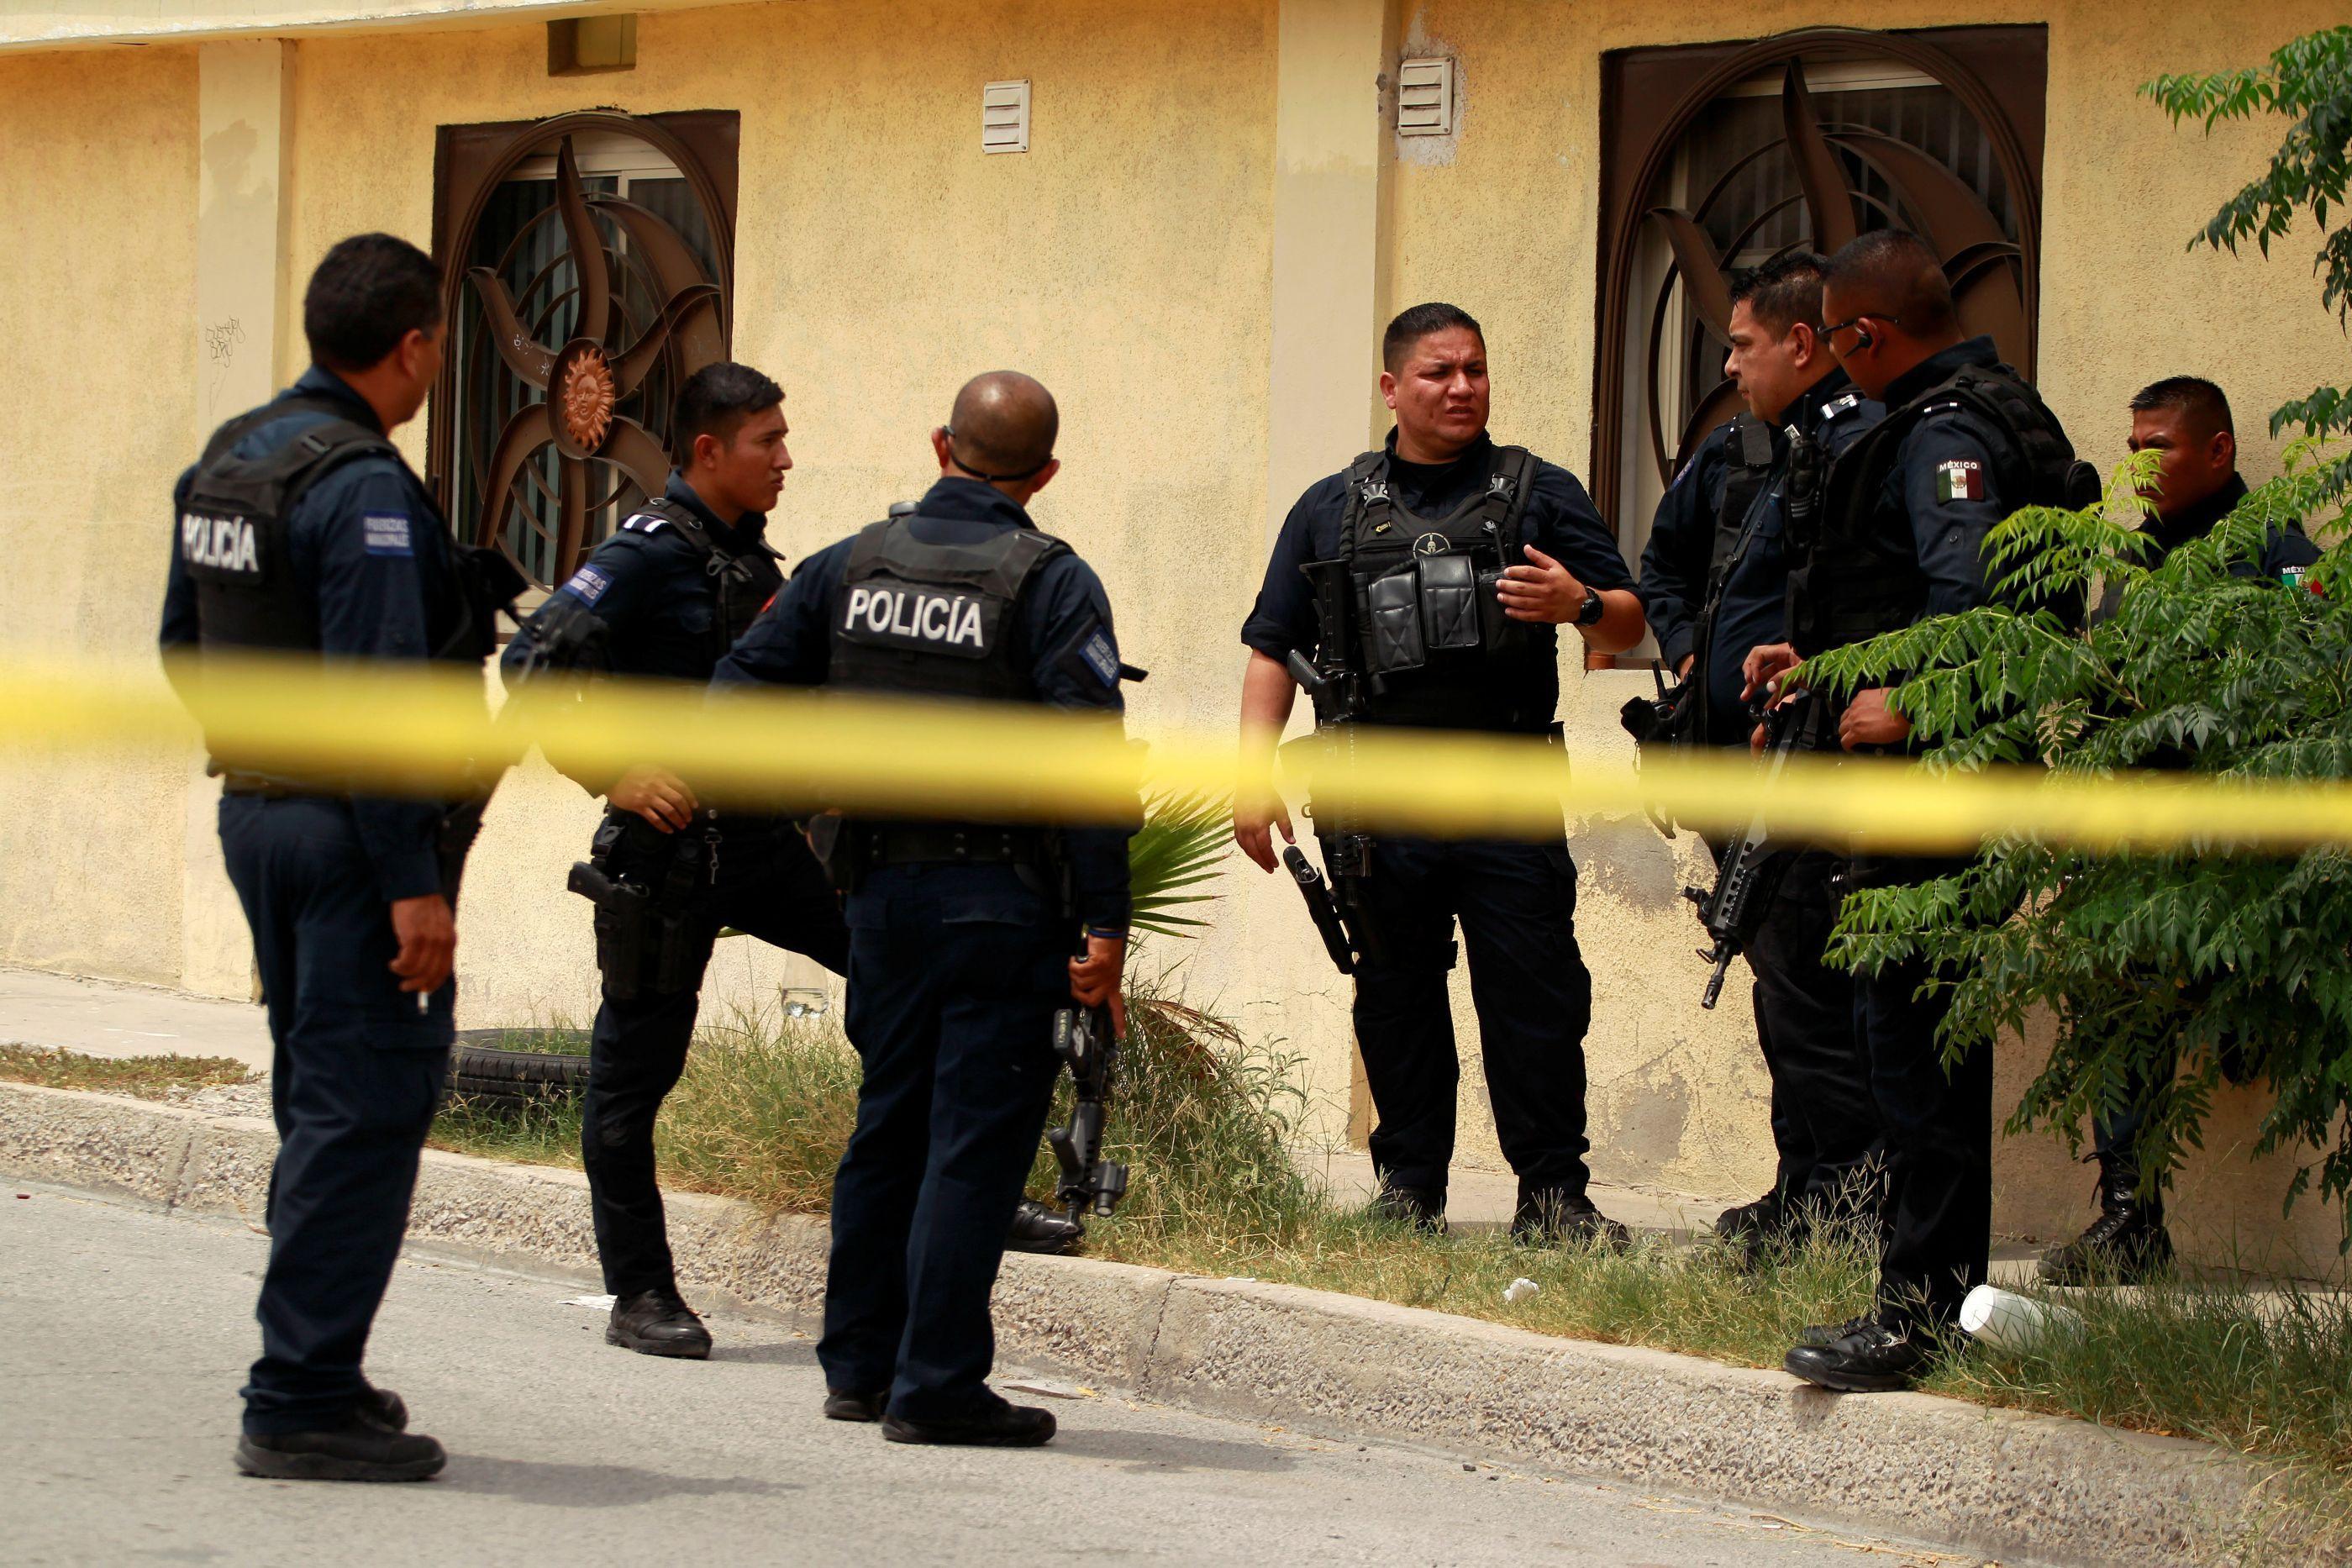 Encontrados 20 cadáveres dentro de veículos no México